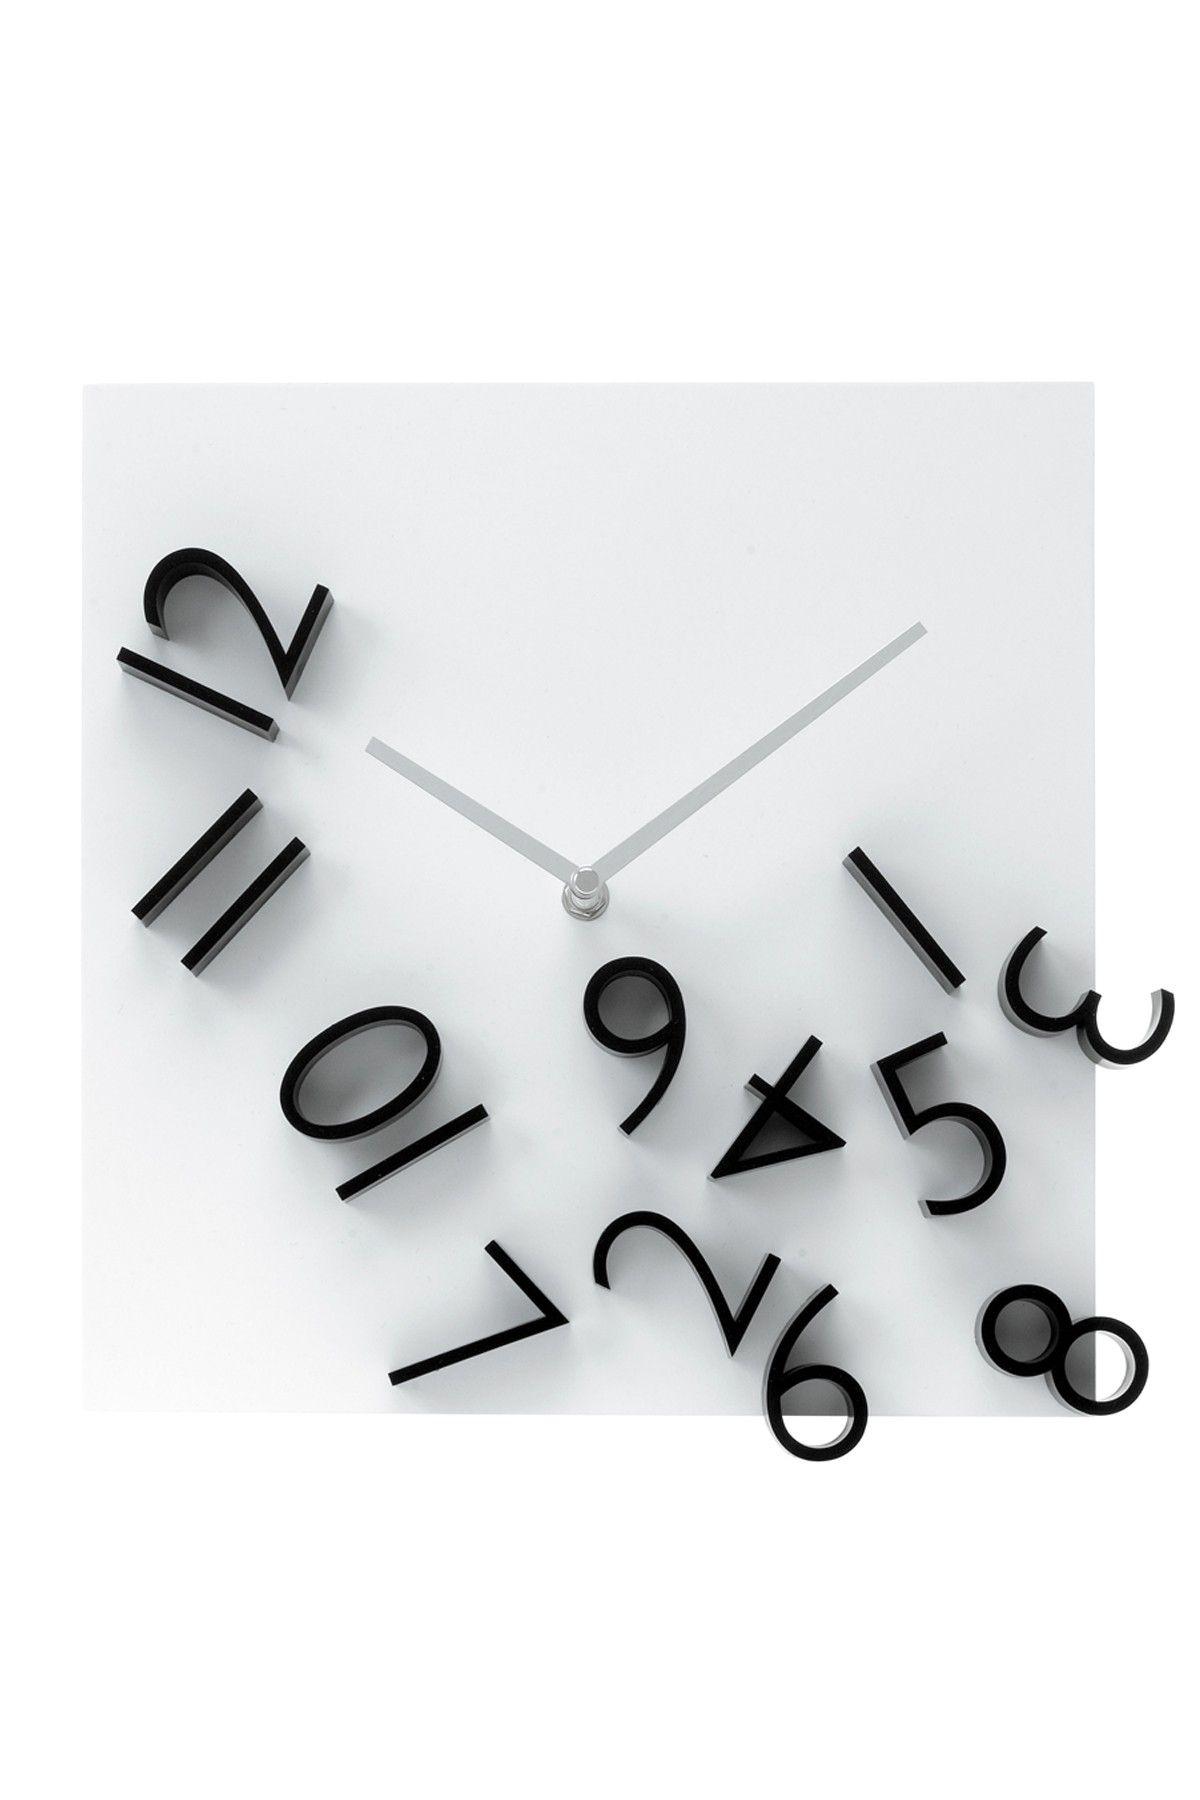 Falling Numbers Wall Clock Wall Clock Wall Clock Design Black Wall Clock